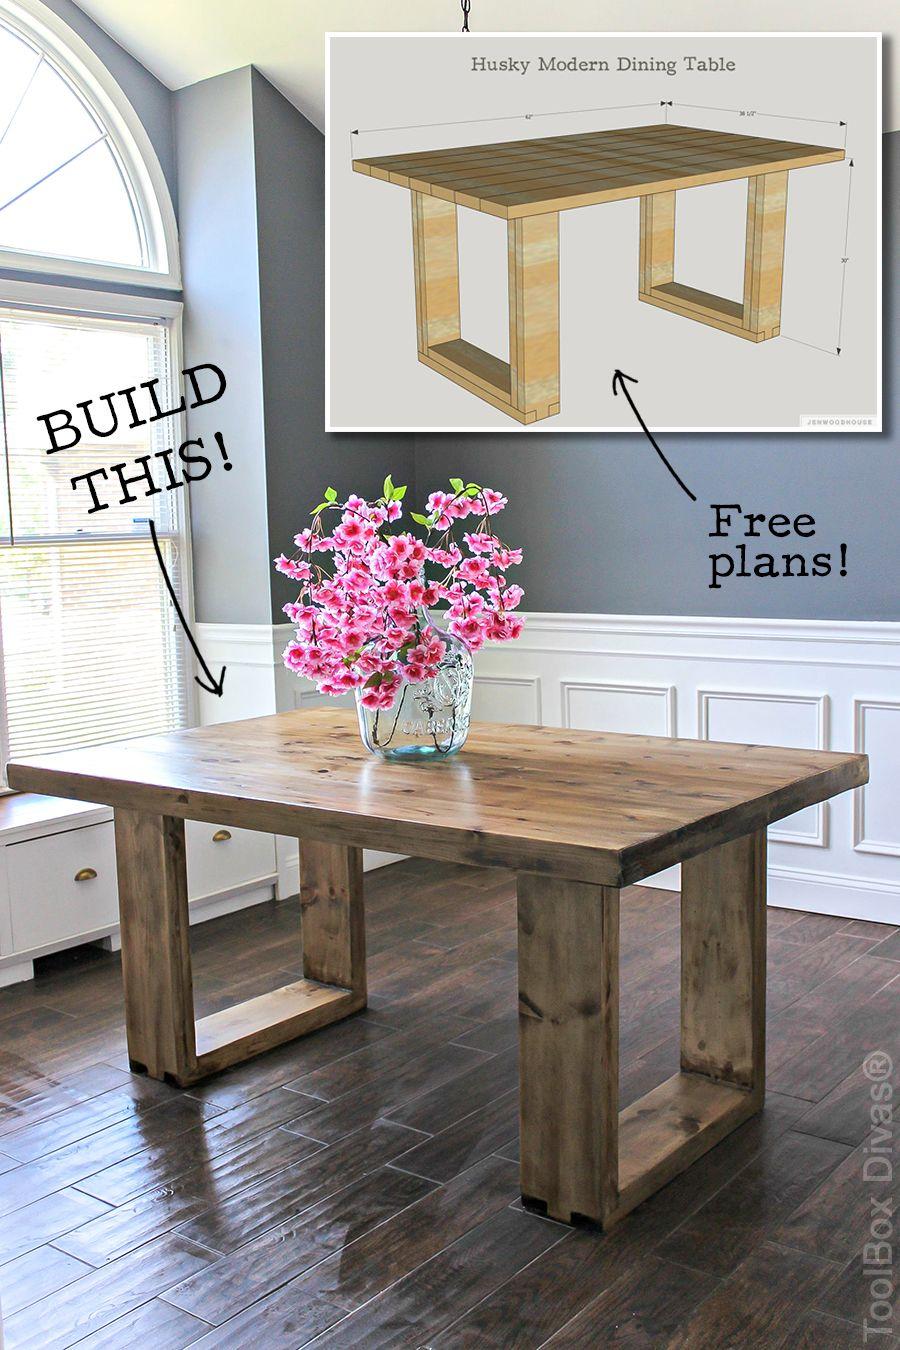 DIY Husky Modern Dining Table Modern, Free and DIY furniture